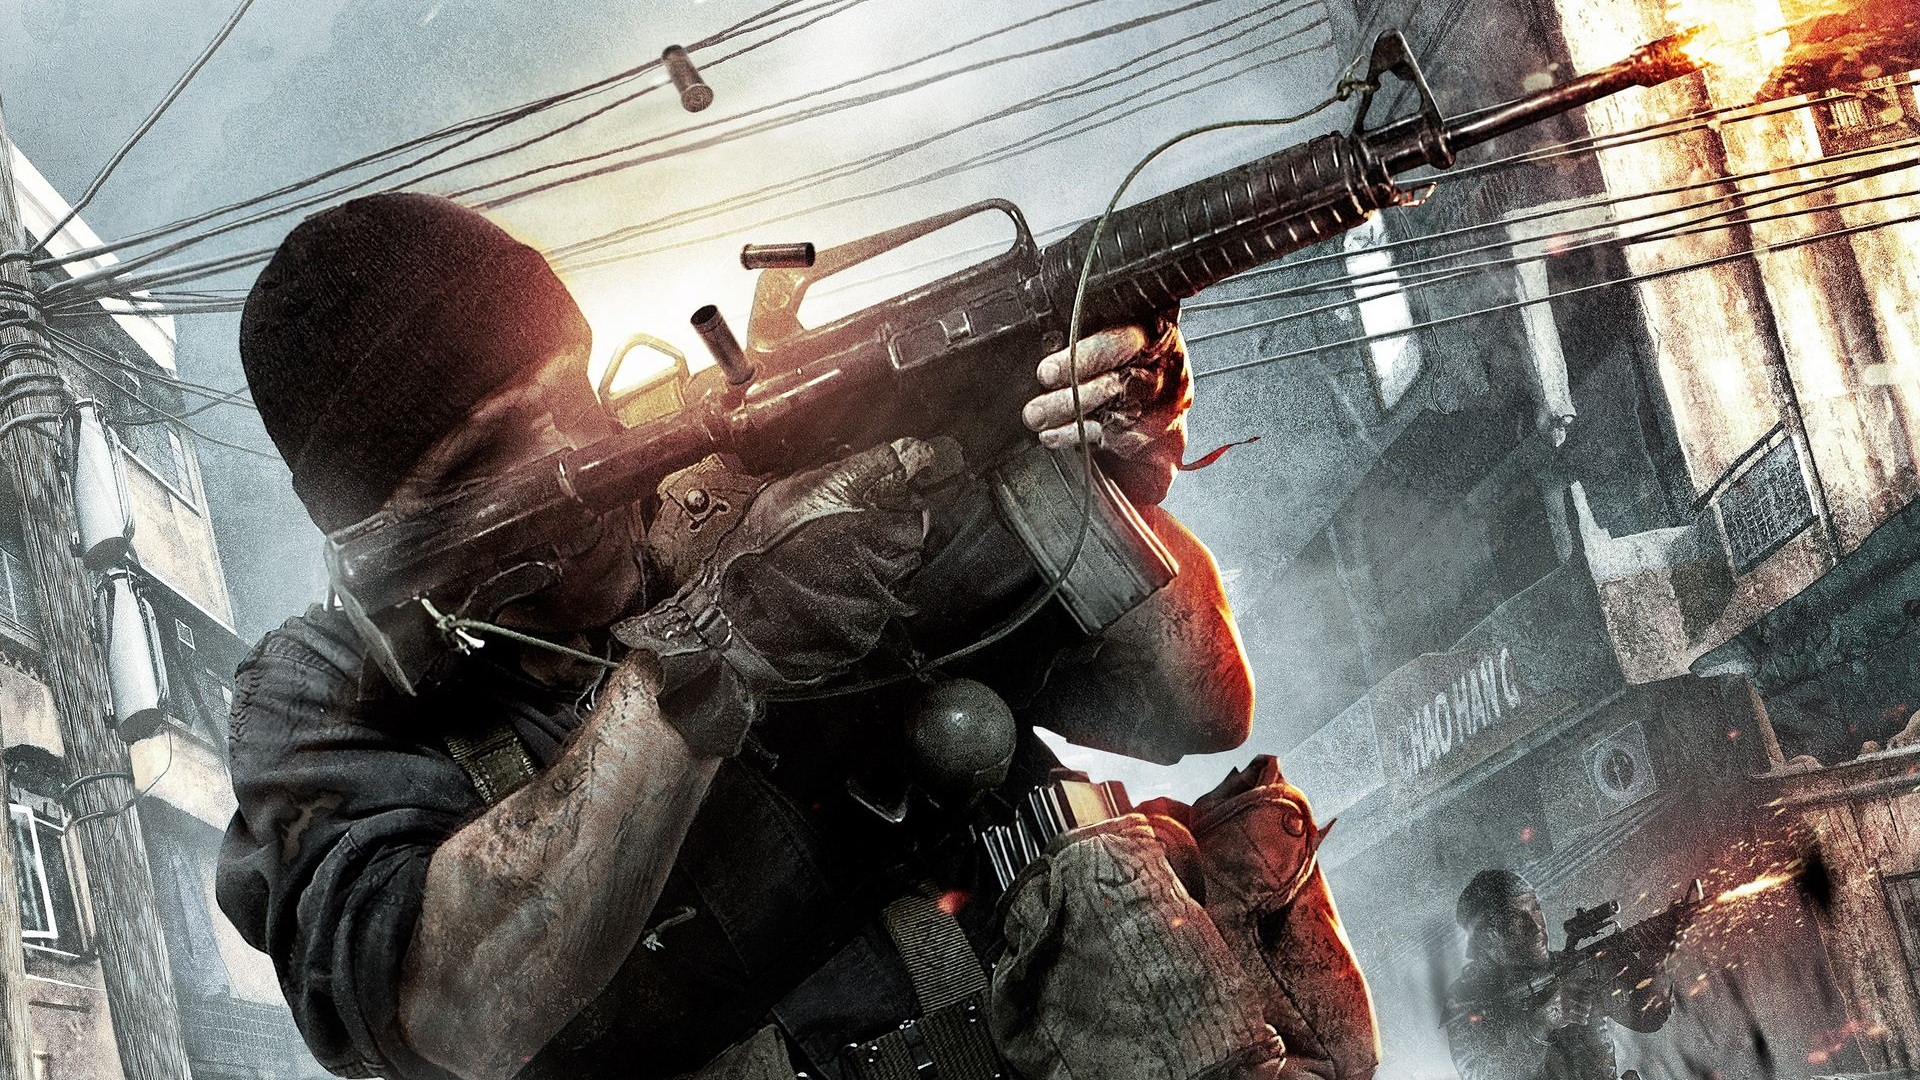 Call Of Duty Black Ops 2 Wallpaper 1920 X 1080: 壁紙 コールオブデューティ:ブラックオプスを HD 1920x1200 HD 無料のデスクトップの背景, 画像